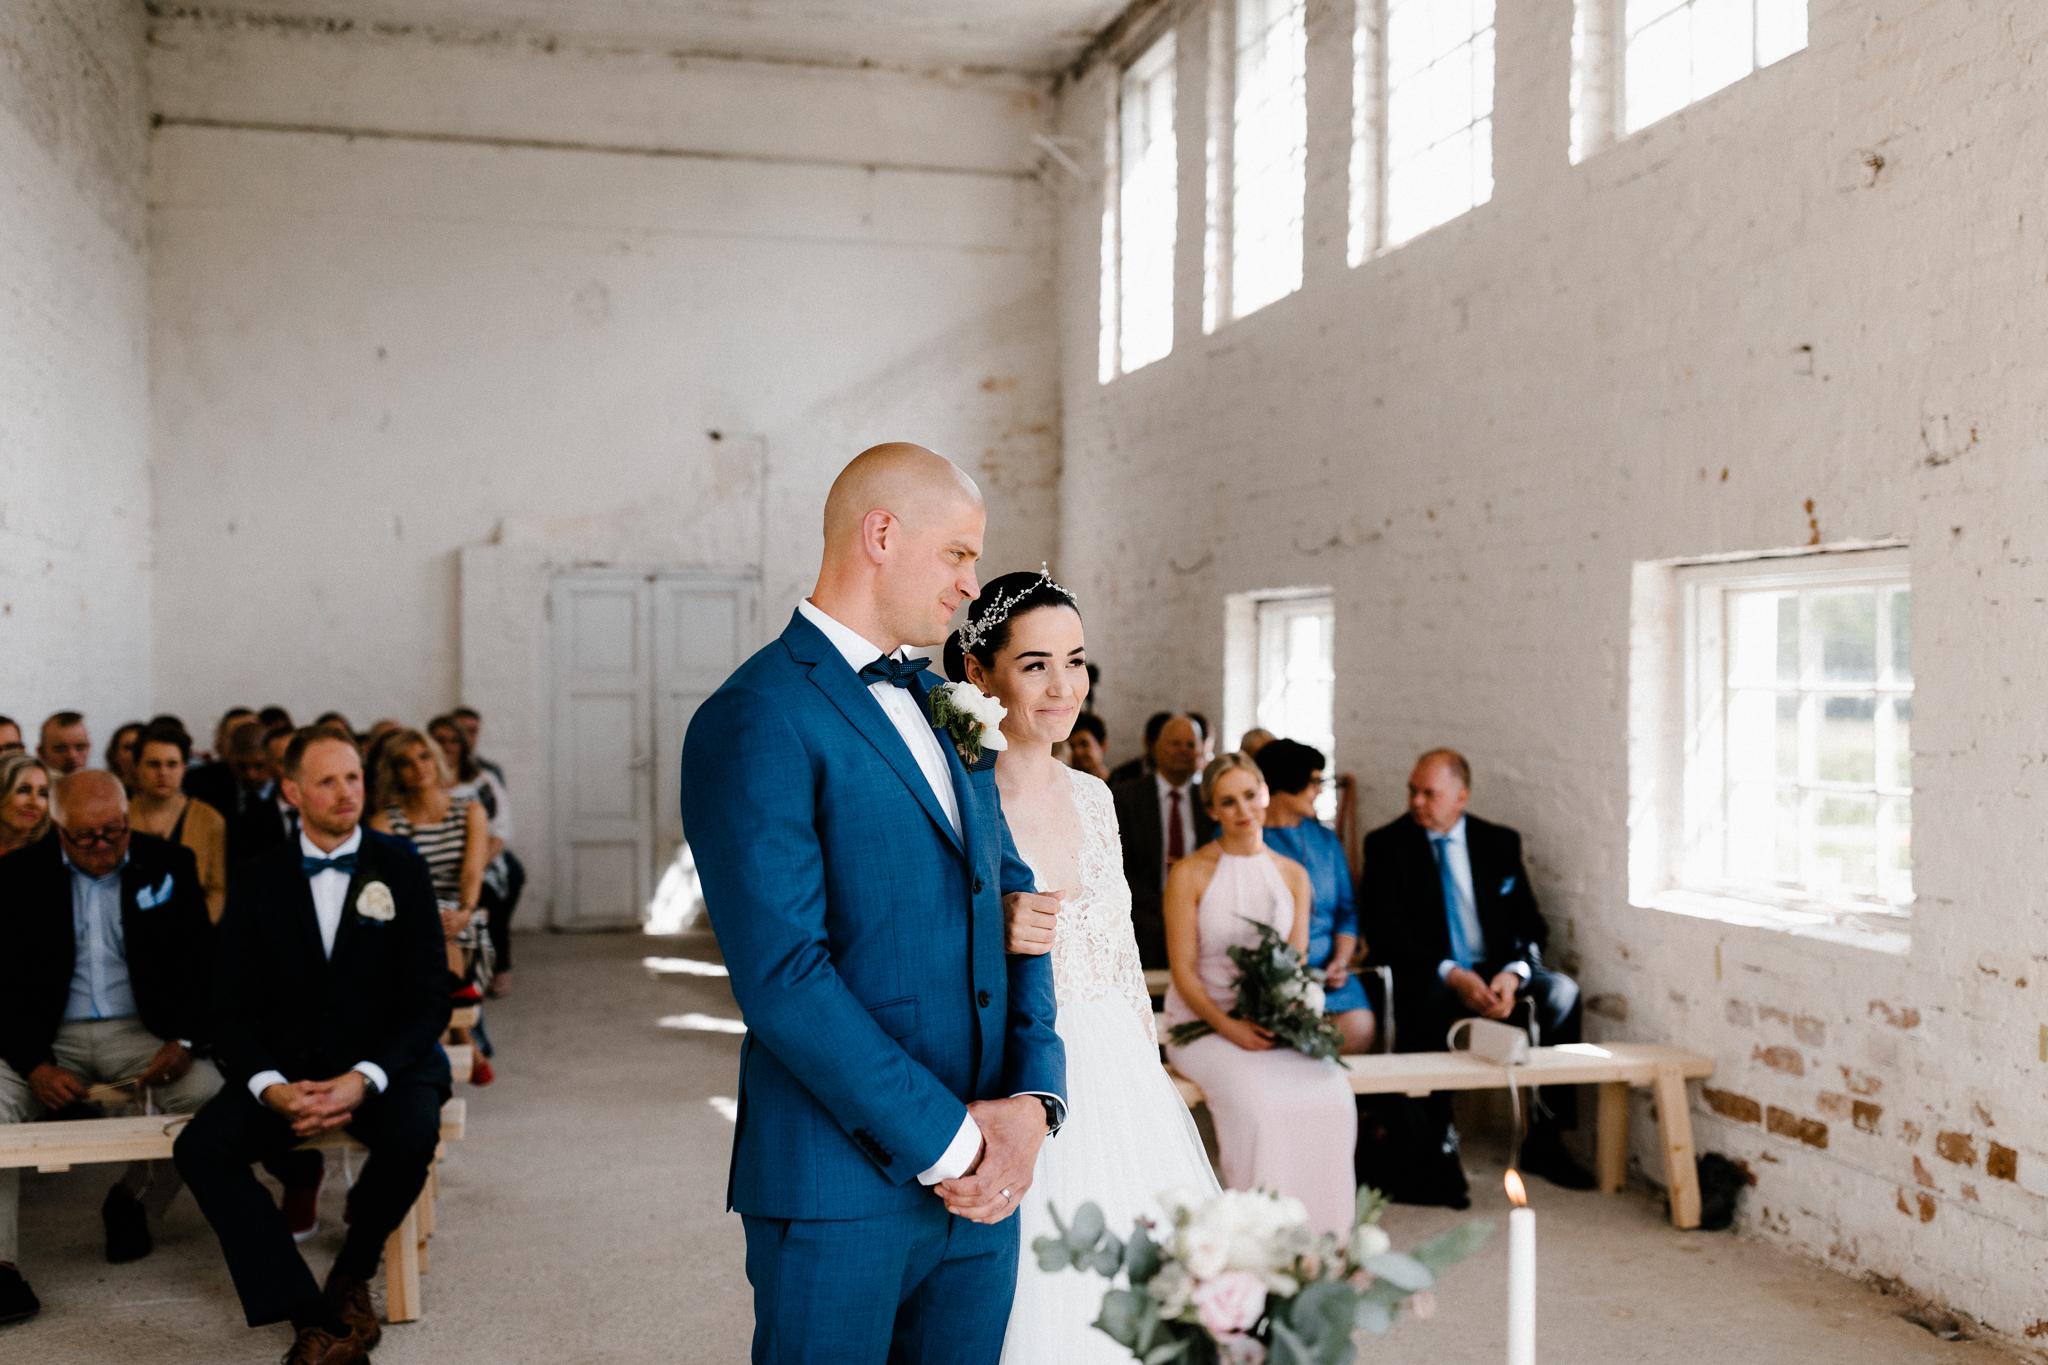 Essi + Ville   Oitbacka Gården   by Patrick Karkkolainen Wedding Photography-160.jpg